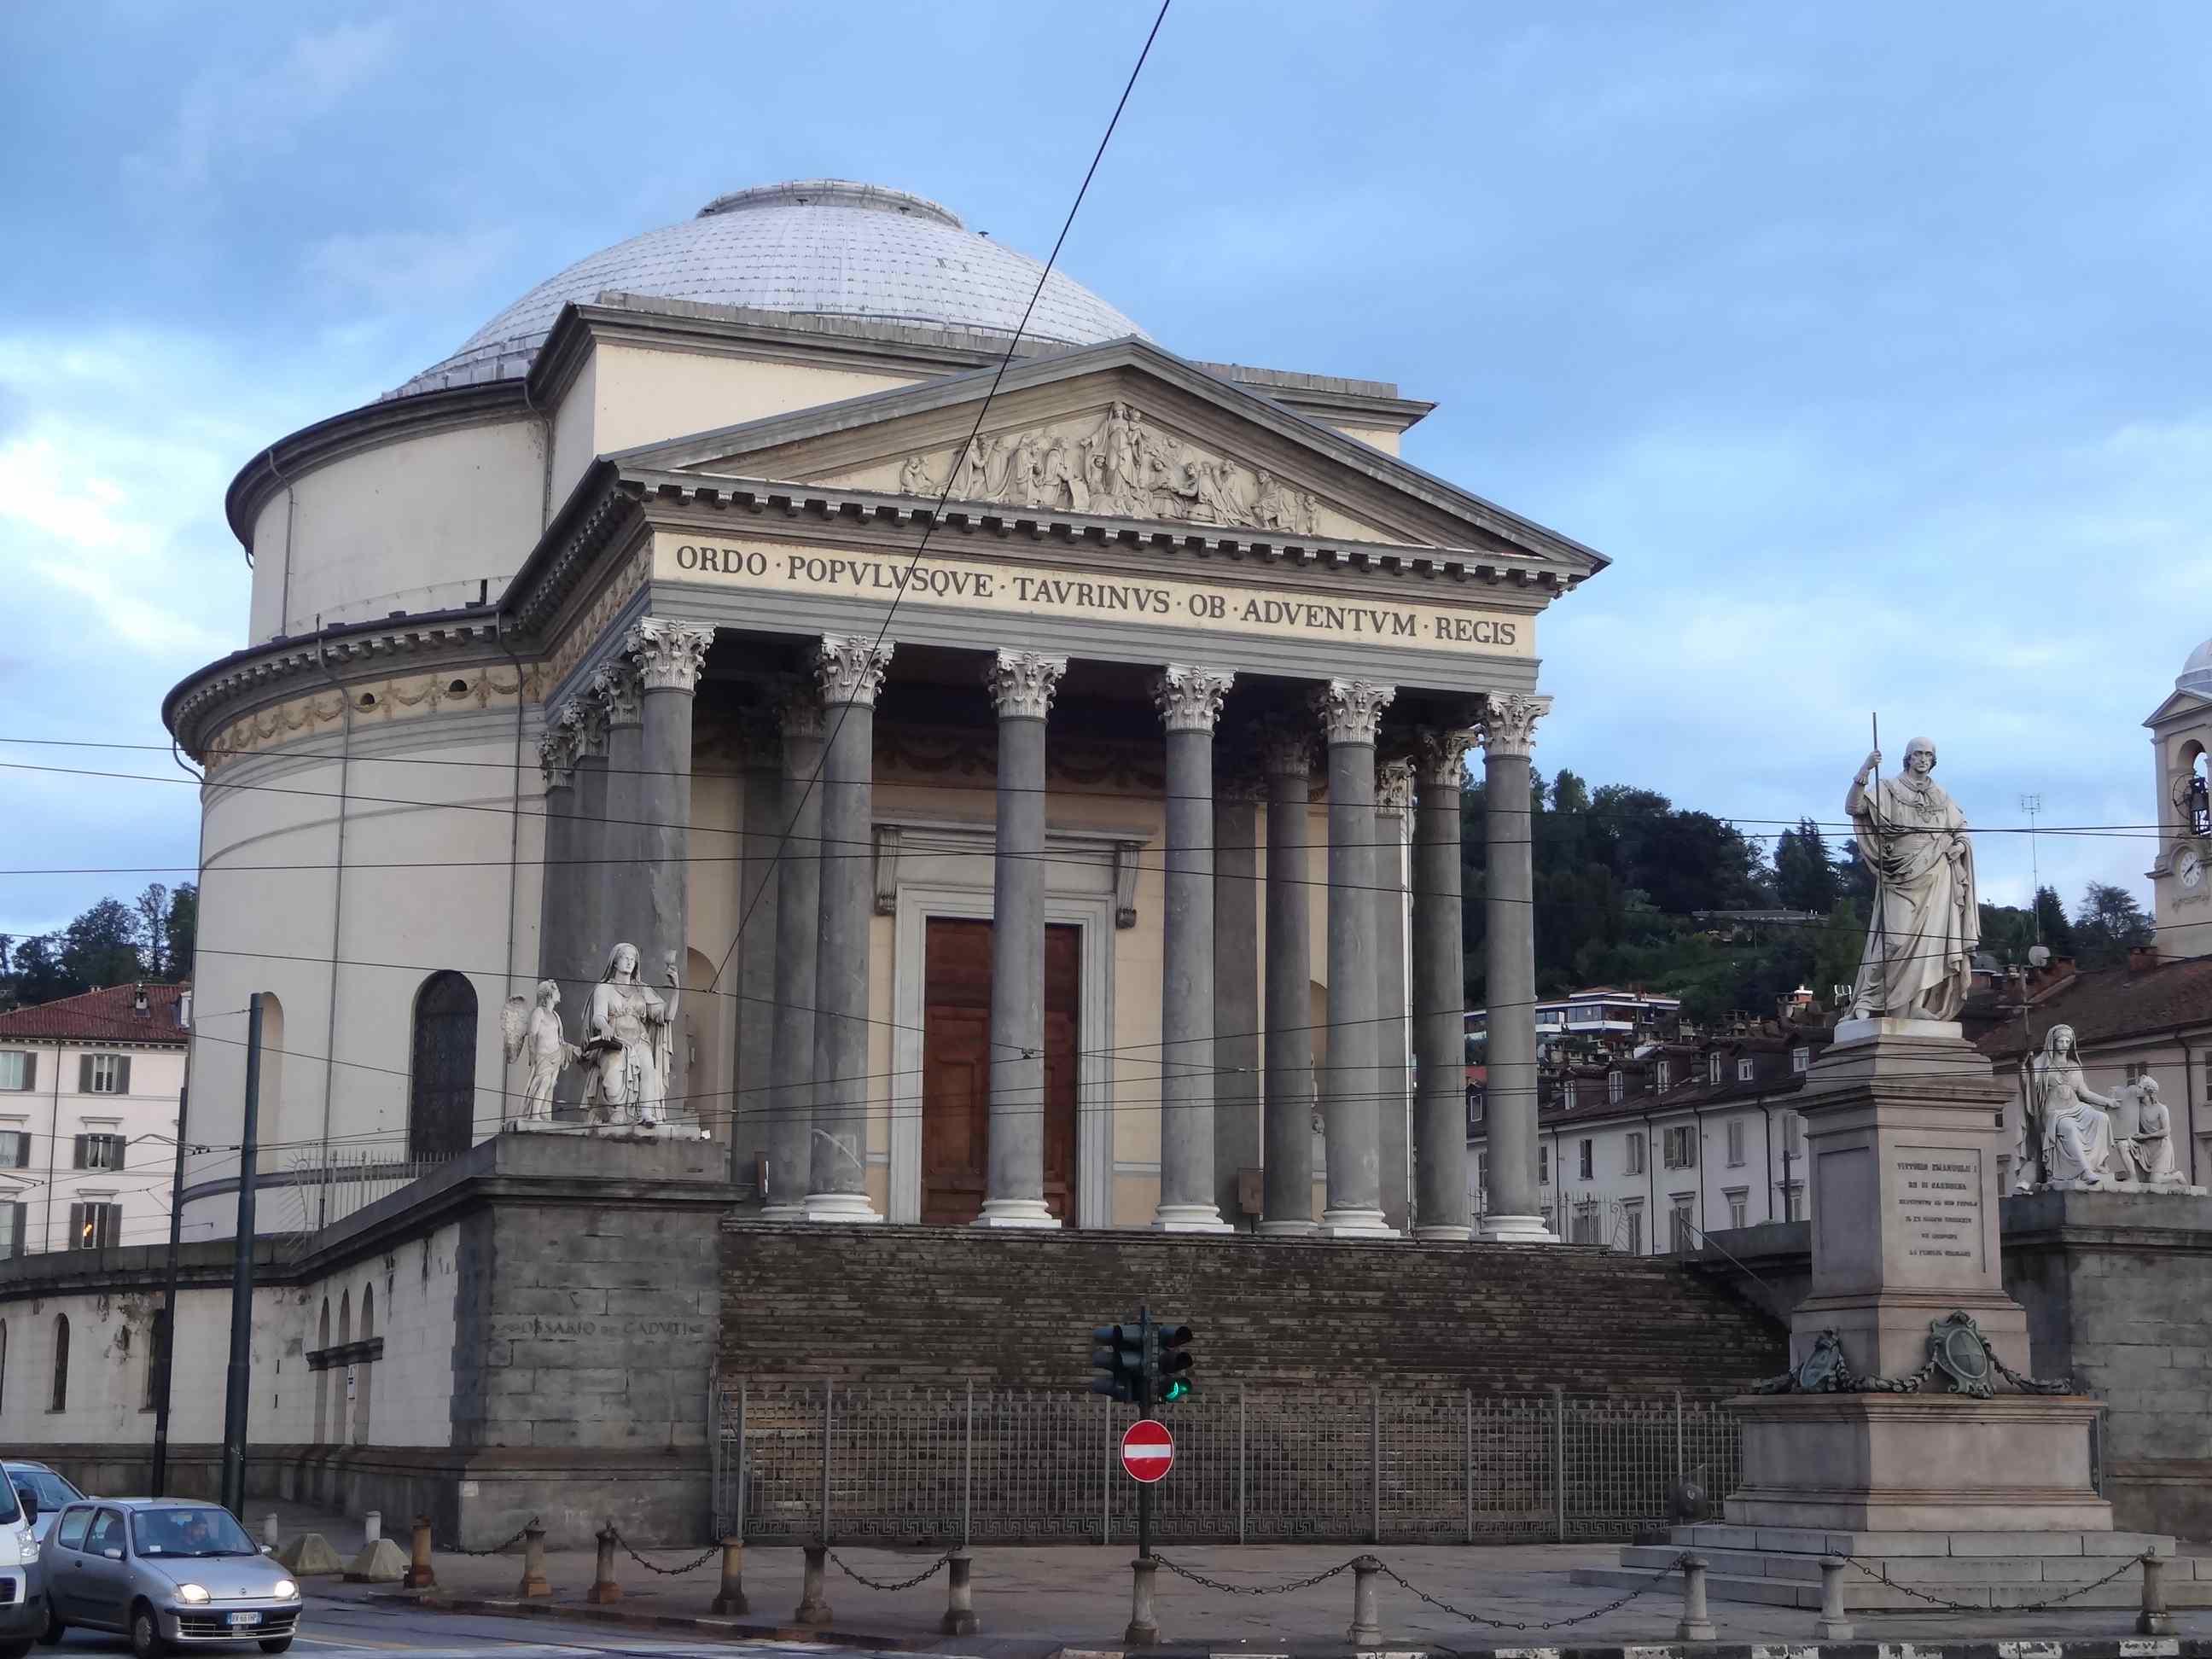 iglesia gran madre dios turin